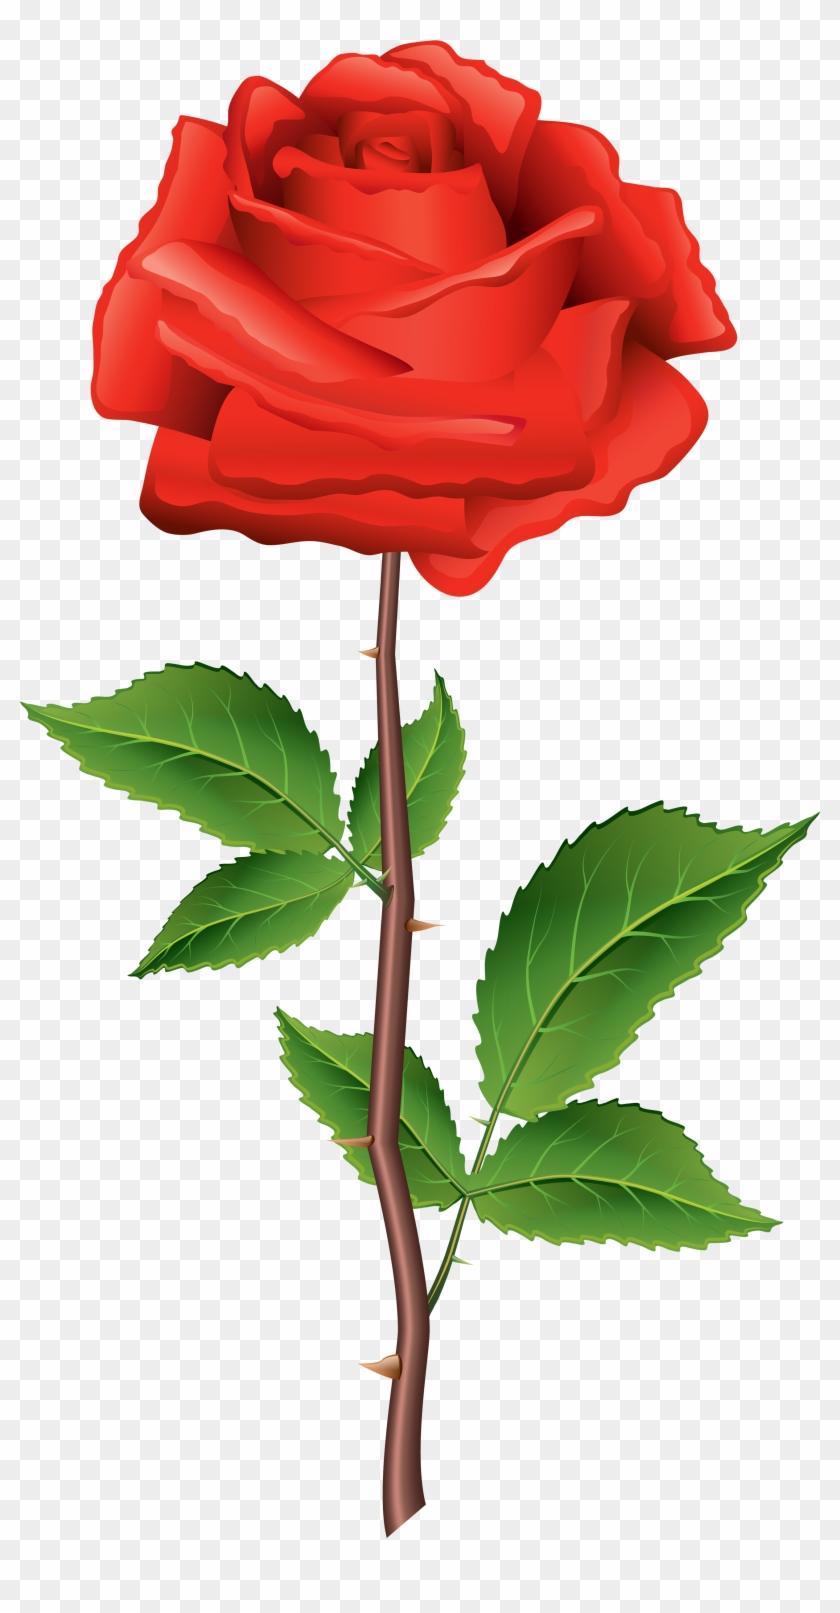 Beautiful Clipart Rose Flower - Rose Clip Art Png #17495